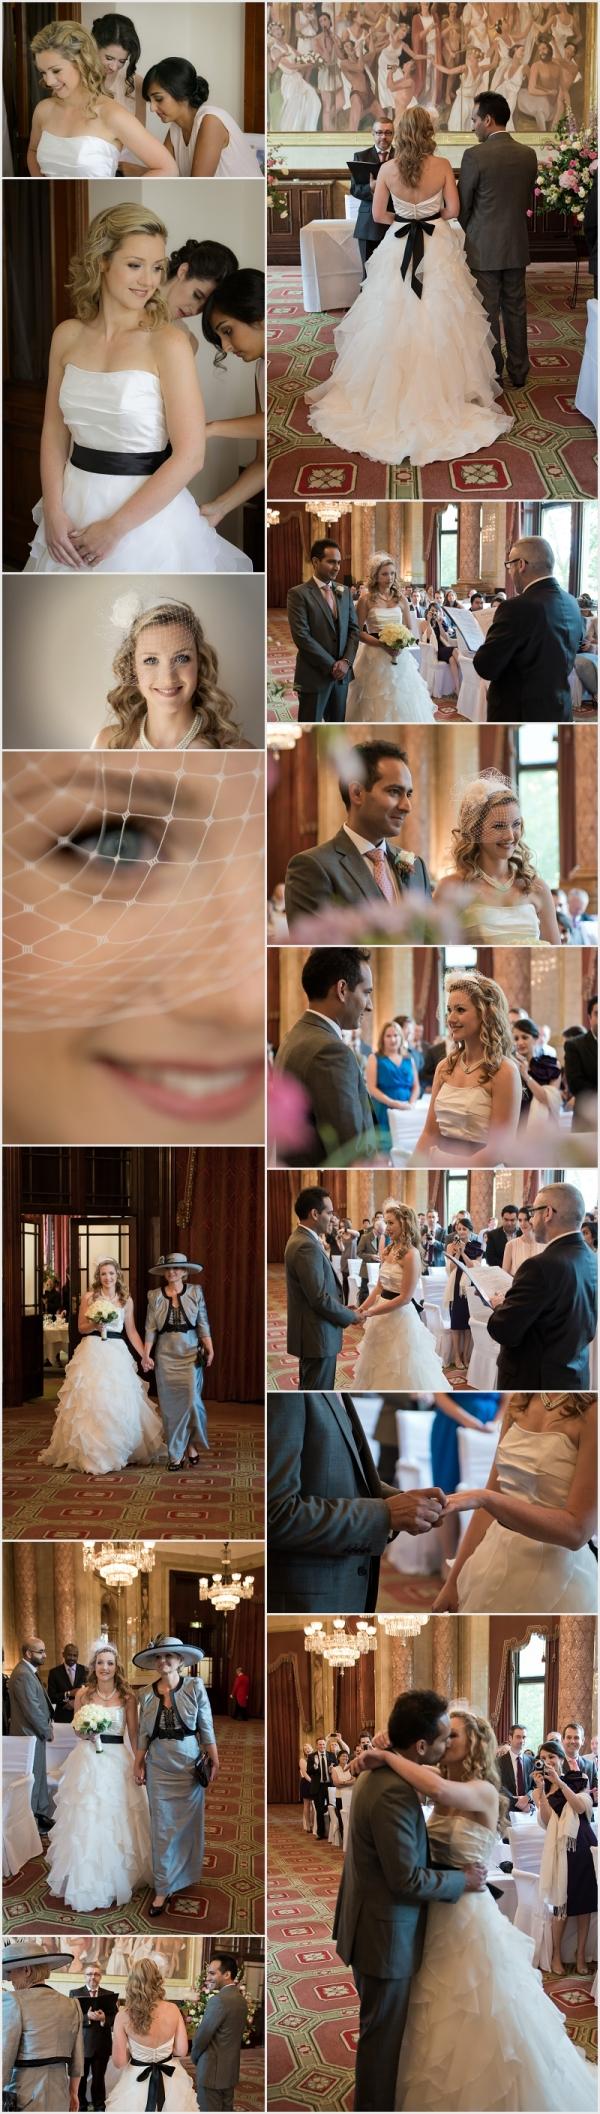 One Whitehall Place Wedding, London wedding photographer_004.jpg